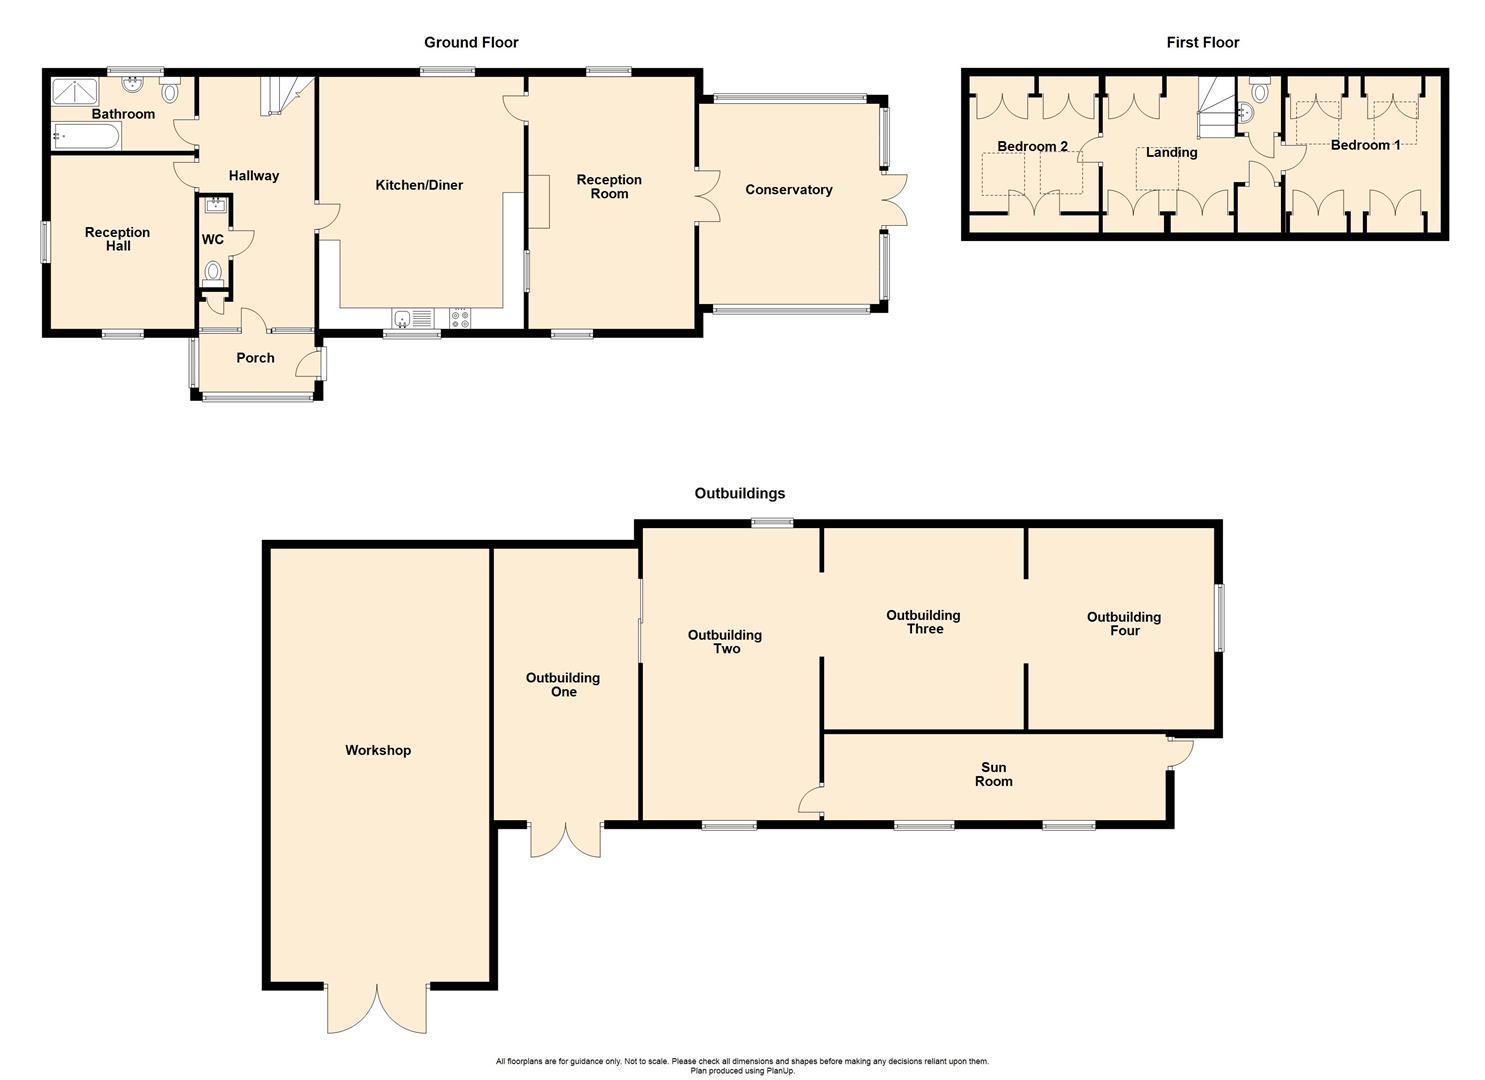 2 Bedroom Barn Conversion For Sale - Sunnyside View, Kings Highway, Accrington.jpg